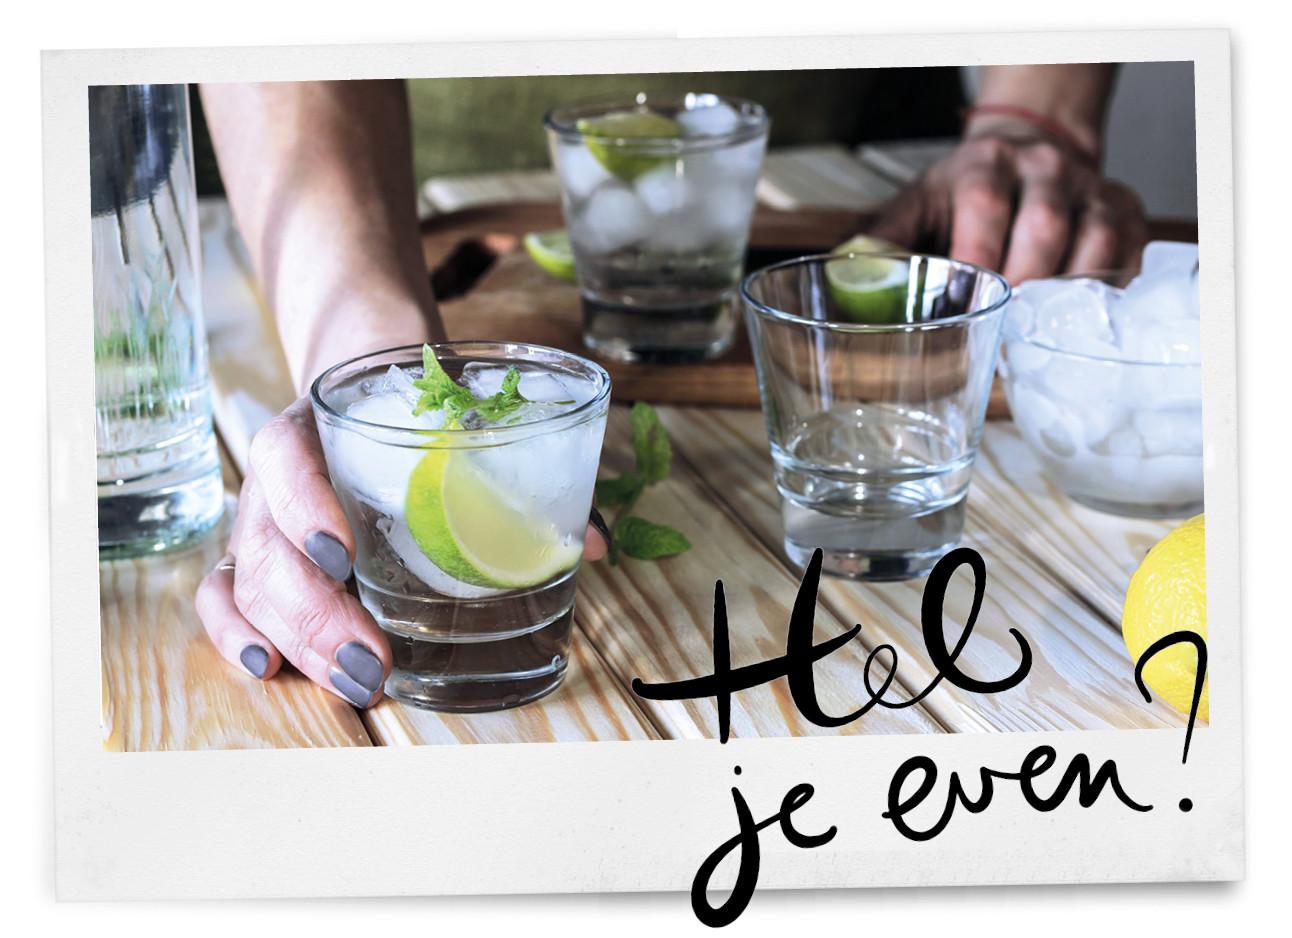 wodka spa rood in glas op tafel